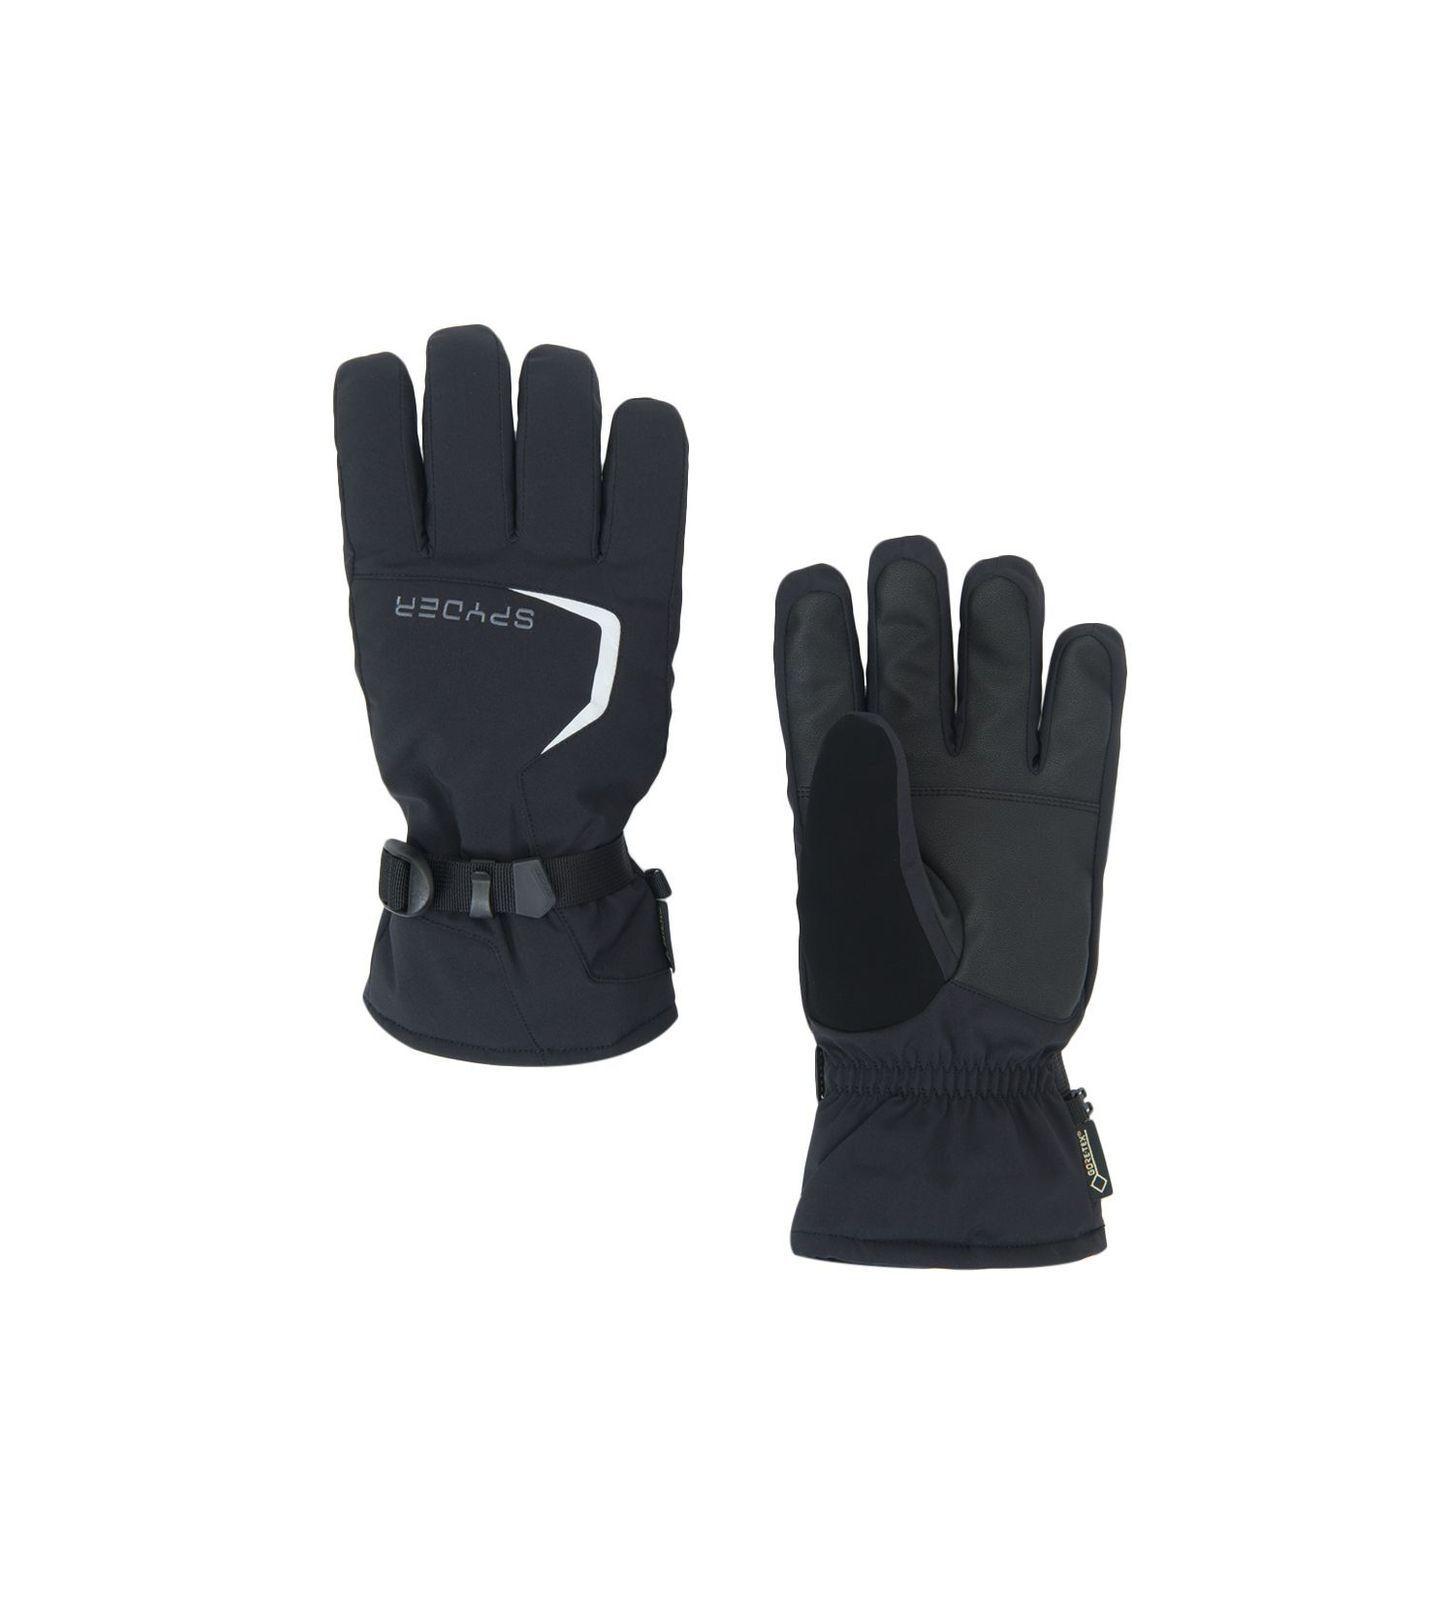 Spyder Herren Skihandschuh Propulsion Gore Tex Glove Man Ski Handschuh Handschuh Handschuh GTX schw e0a8ce